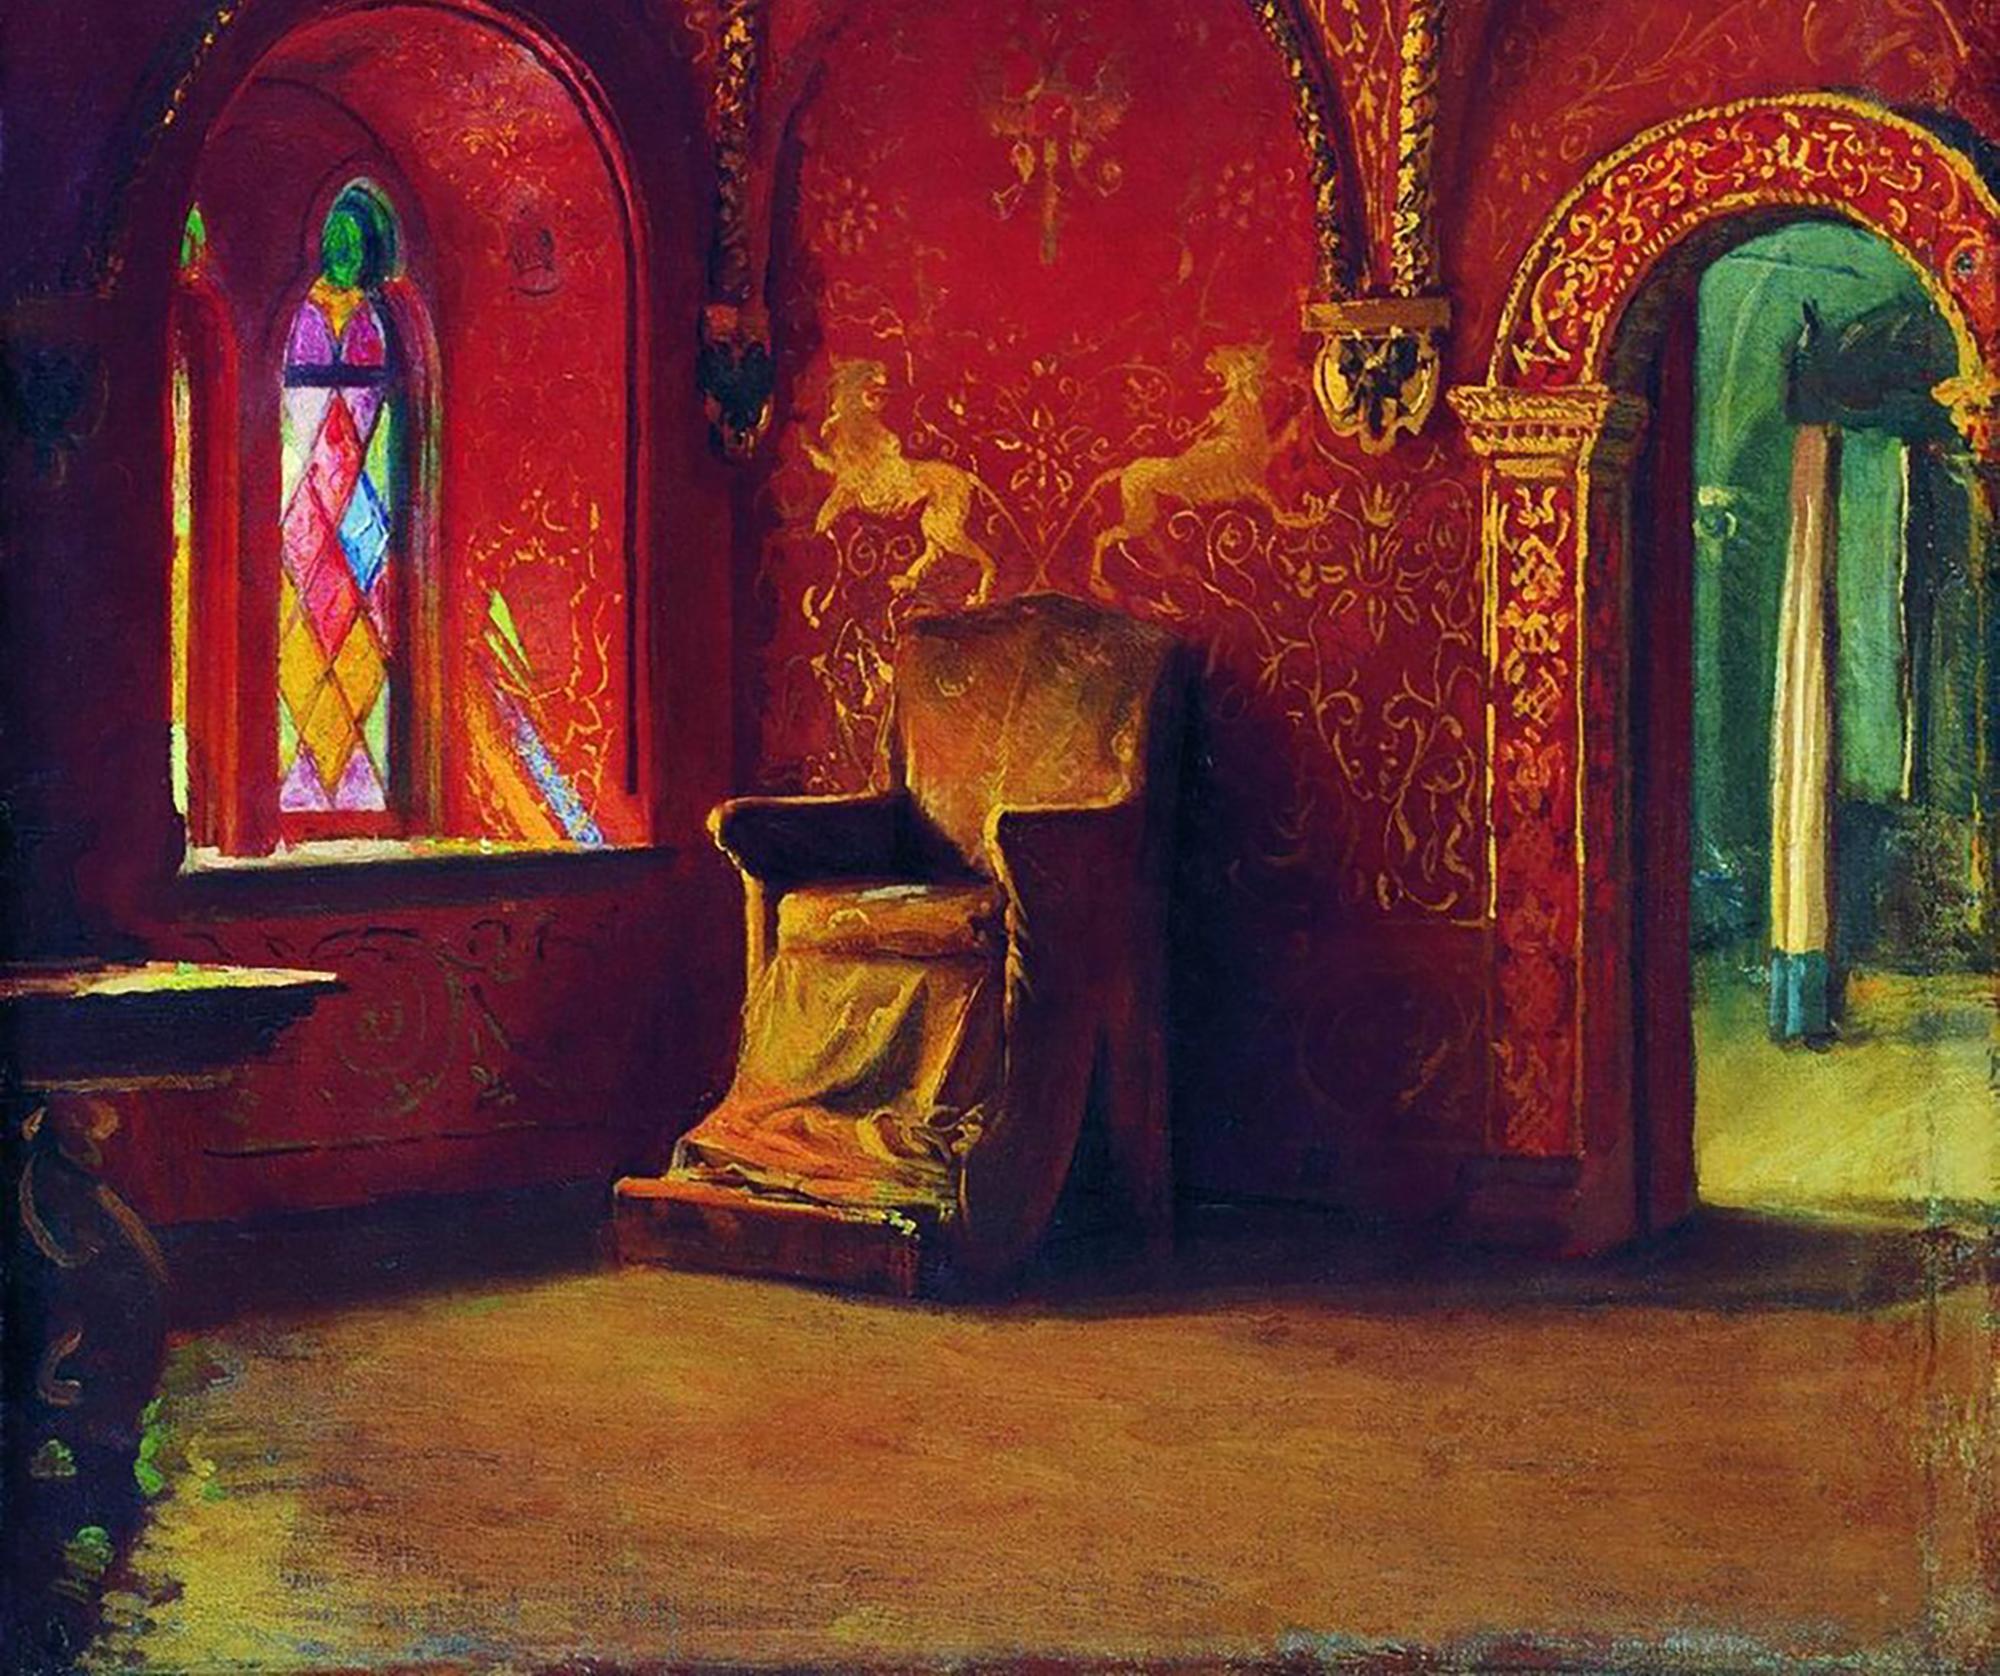 ryabushkin-andrei-red-house